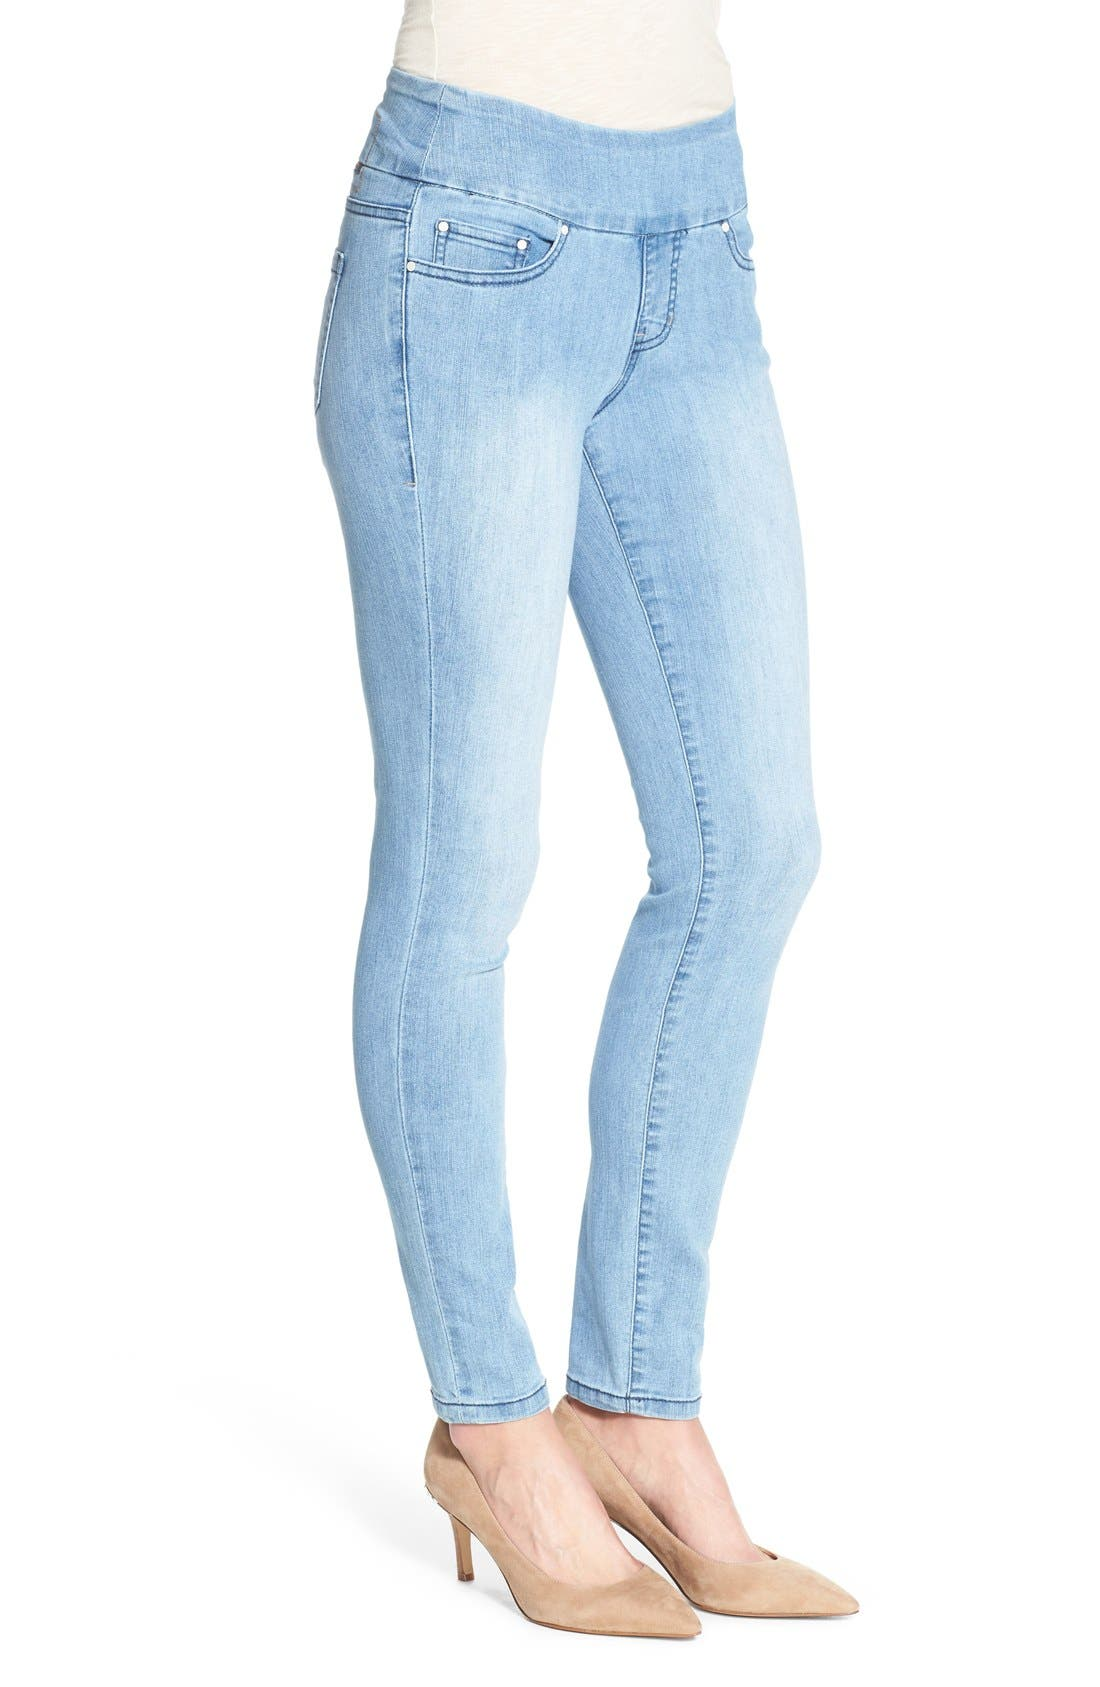 Alternate Image 3  - Jag Jeans 'Nora' Pull-On Stretch Skinny Jeans (Southern Sky)